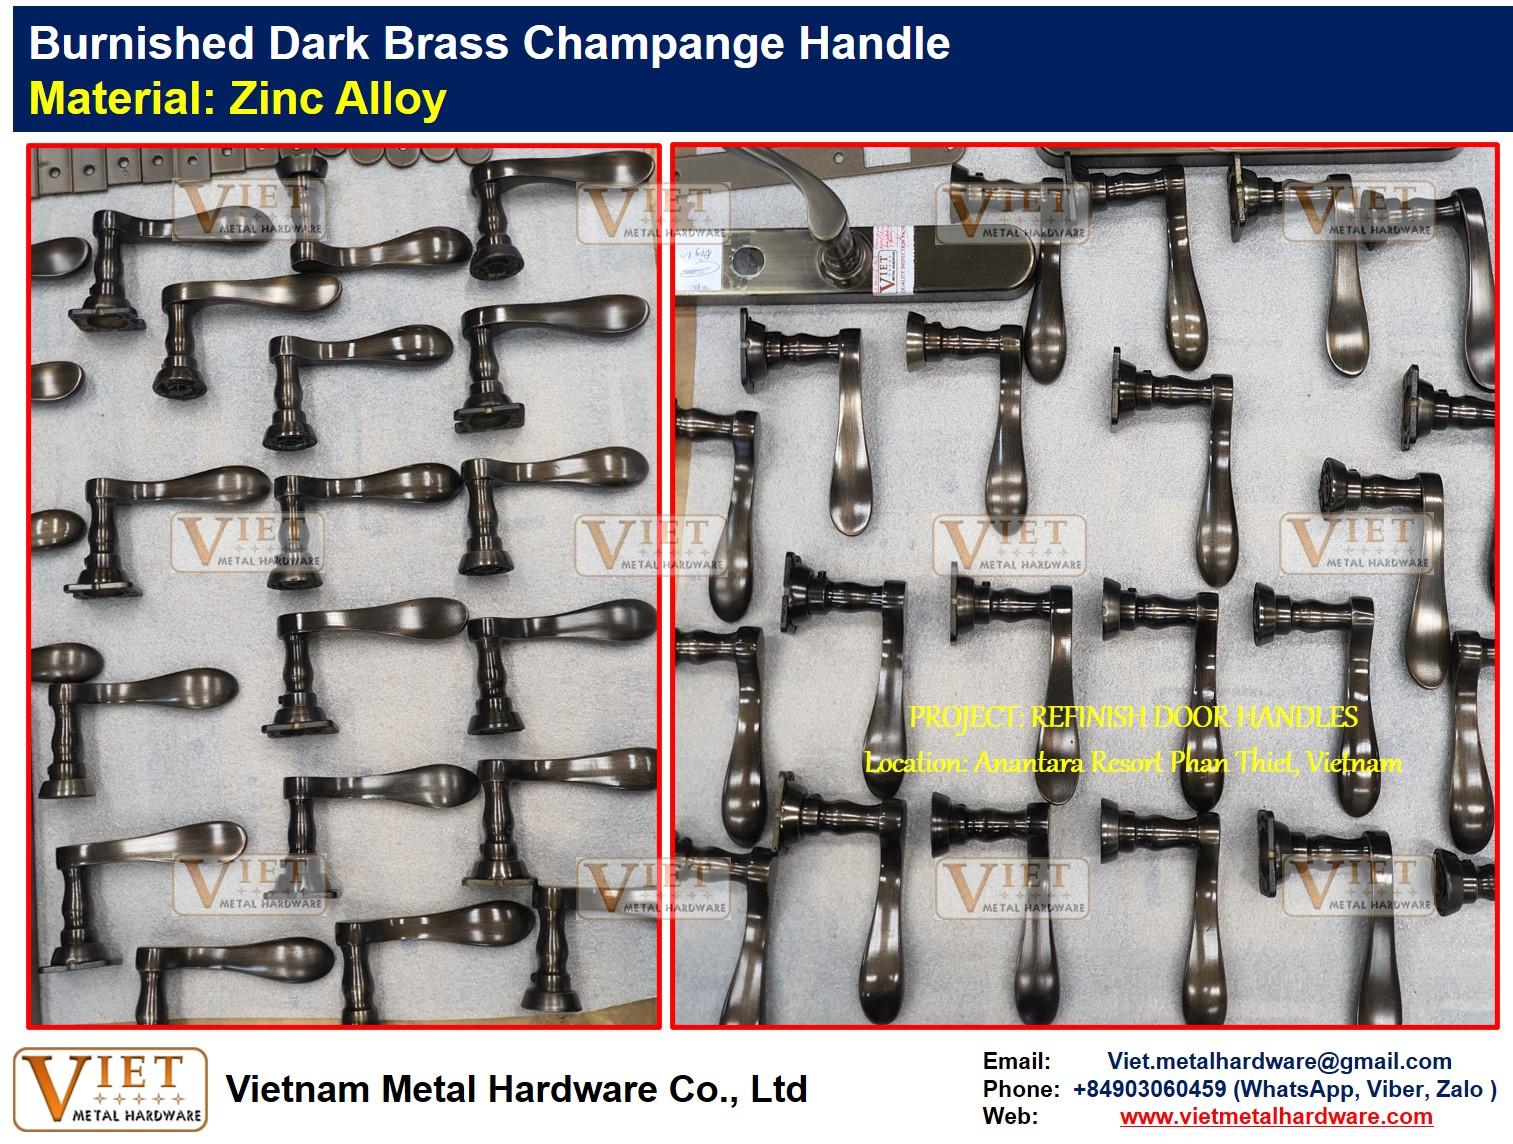 Burnished Dark Brass Champange Handle